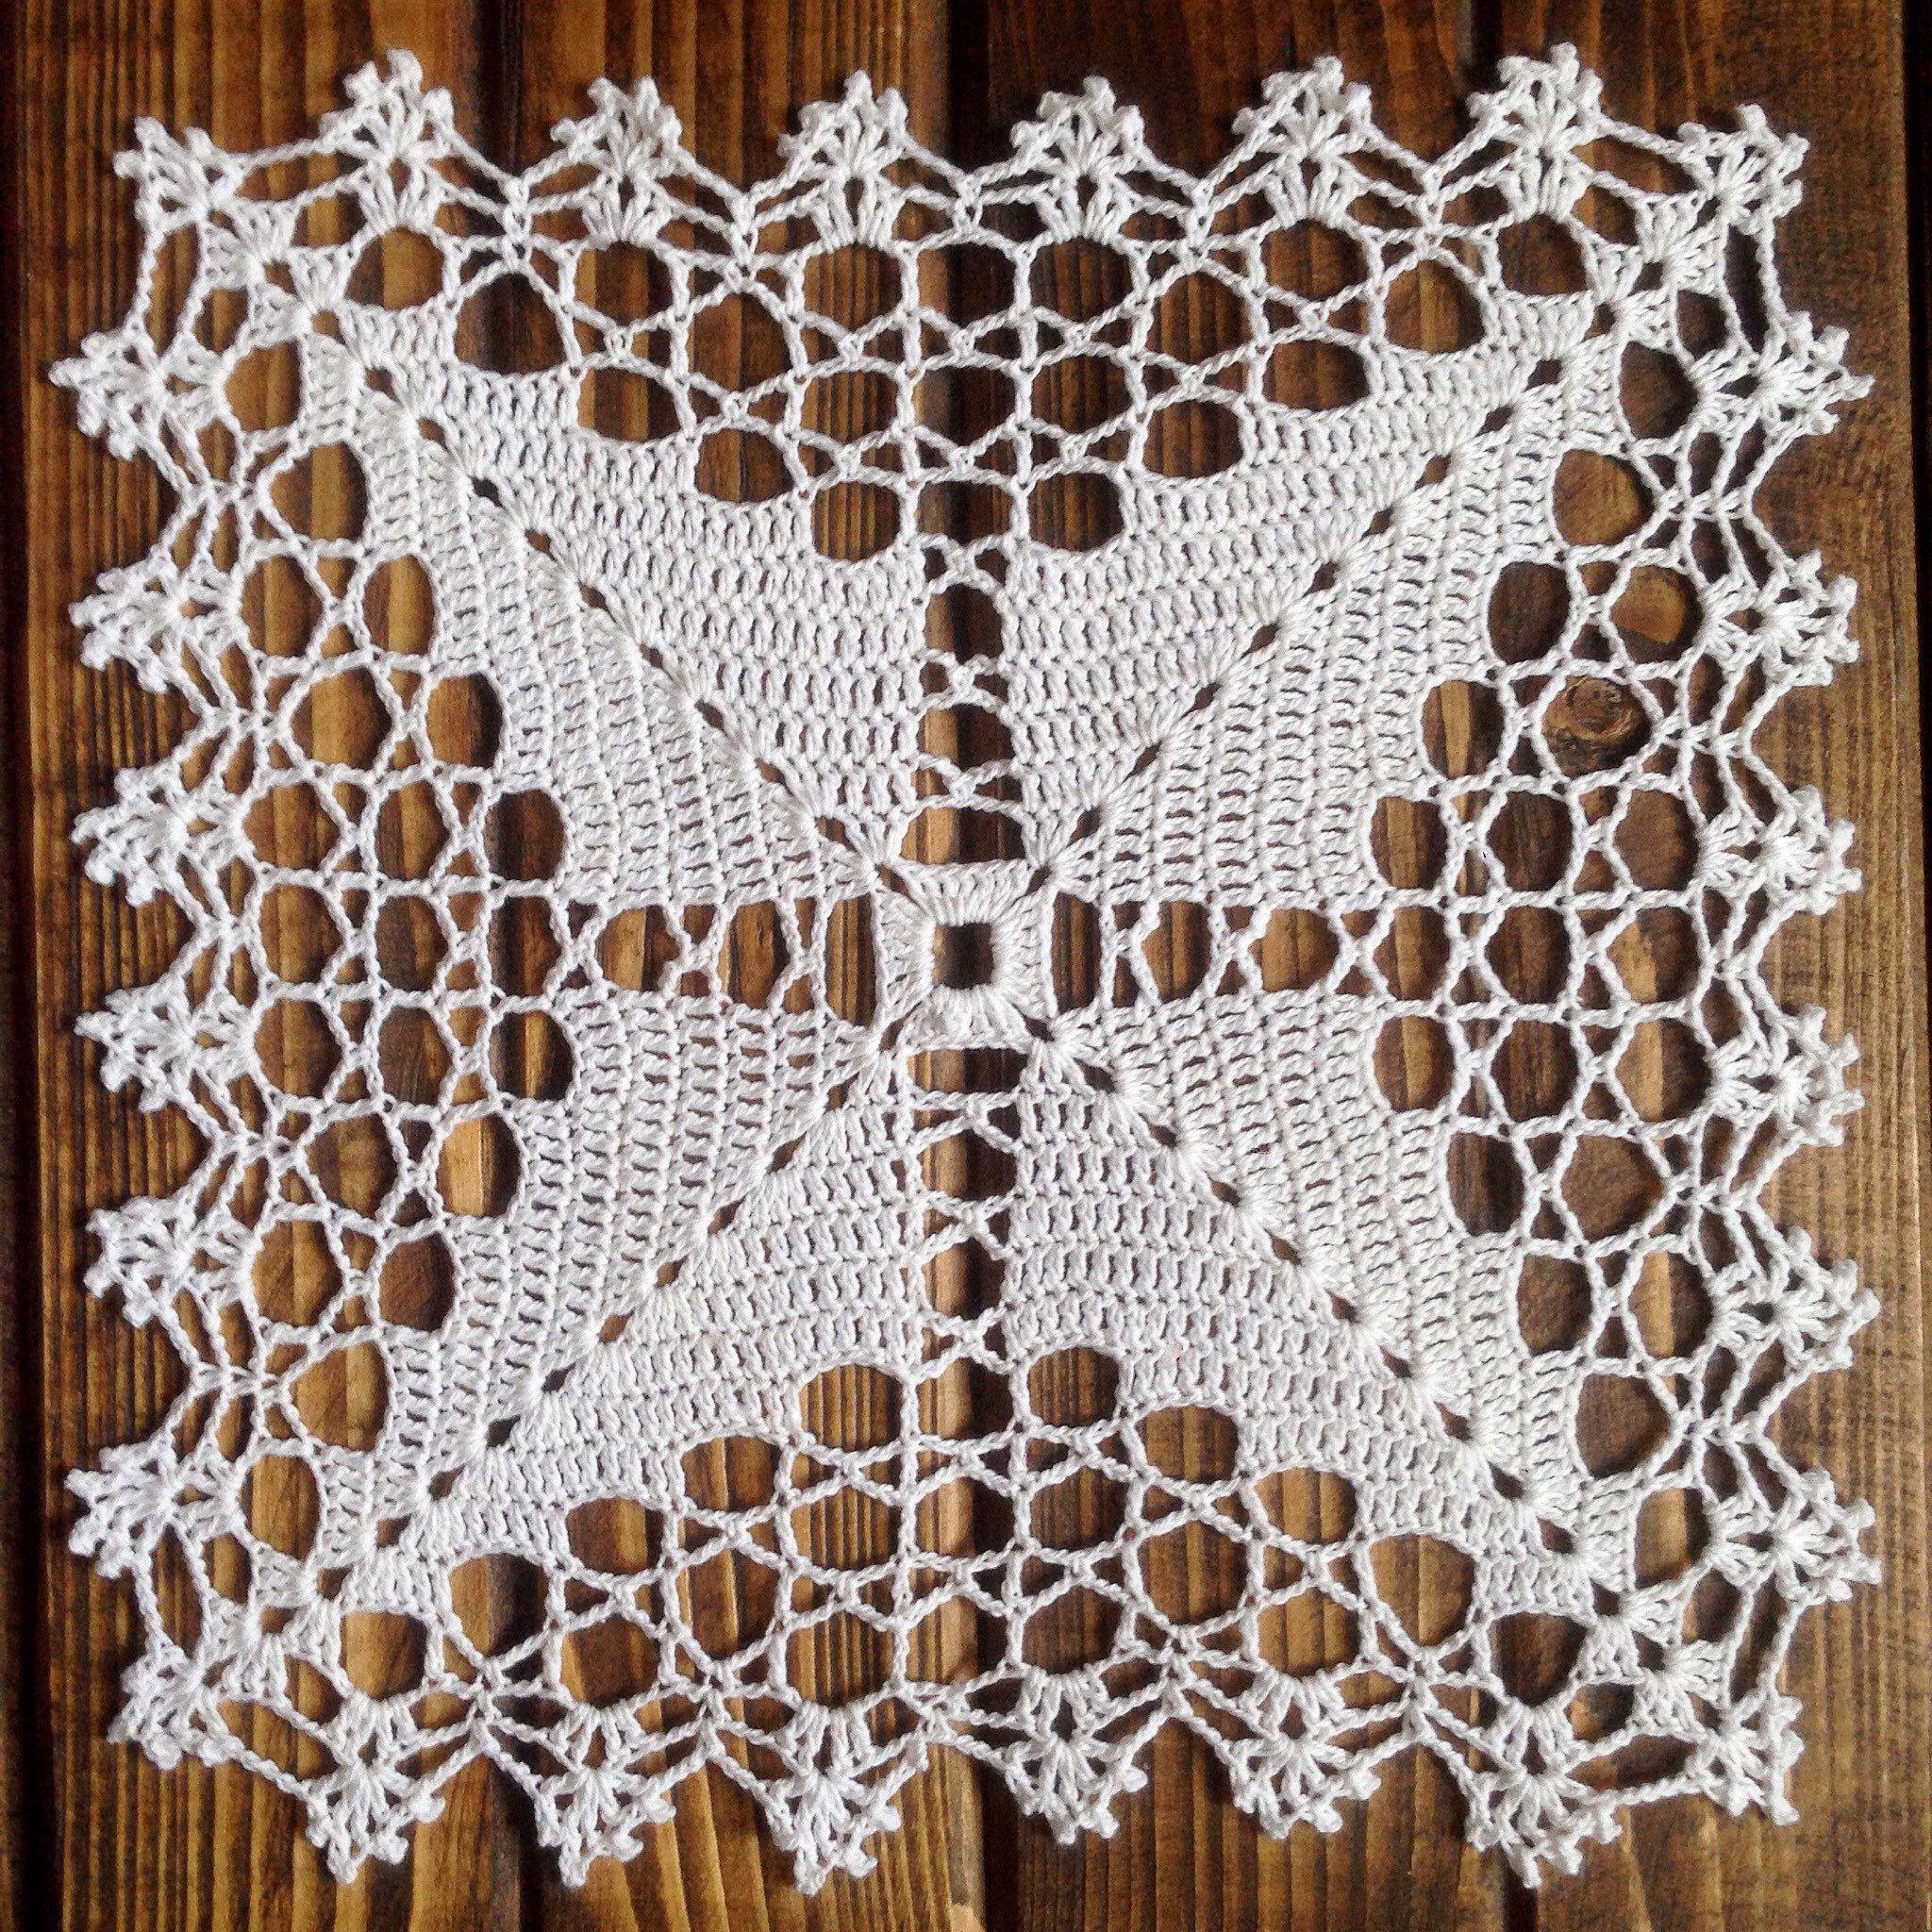 Doily crochet doily doilies set doilies white doily square doily table setting #decorateshop